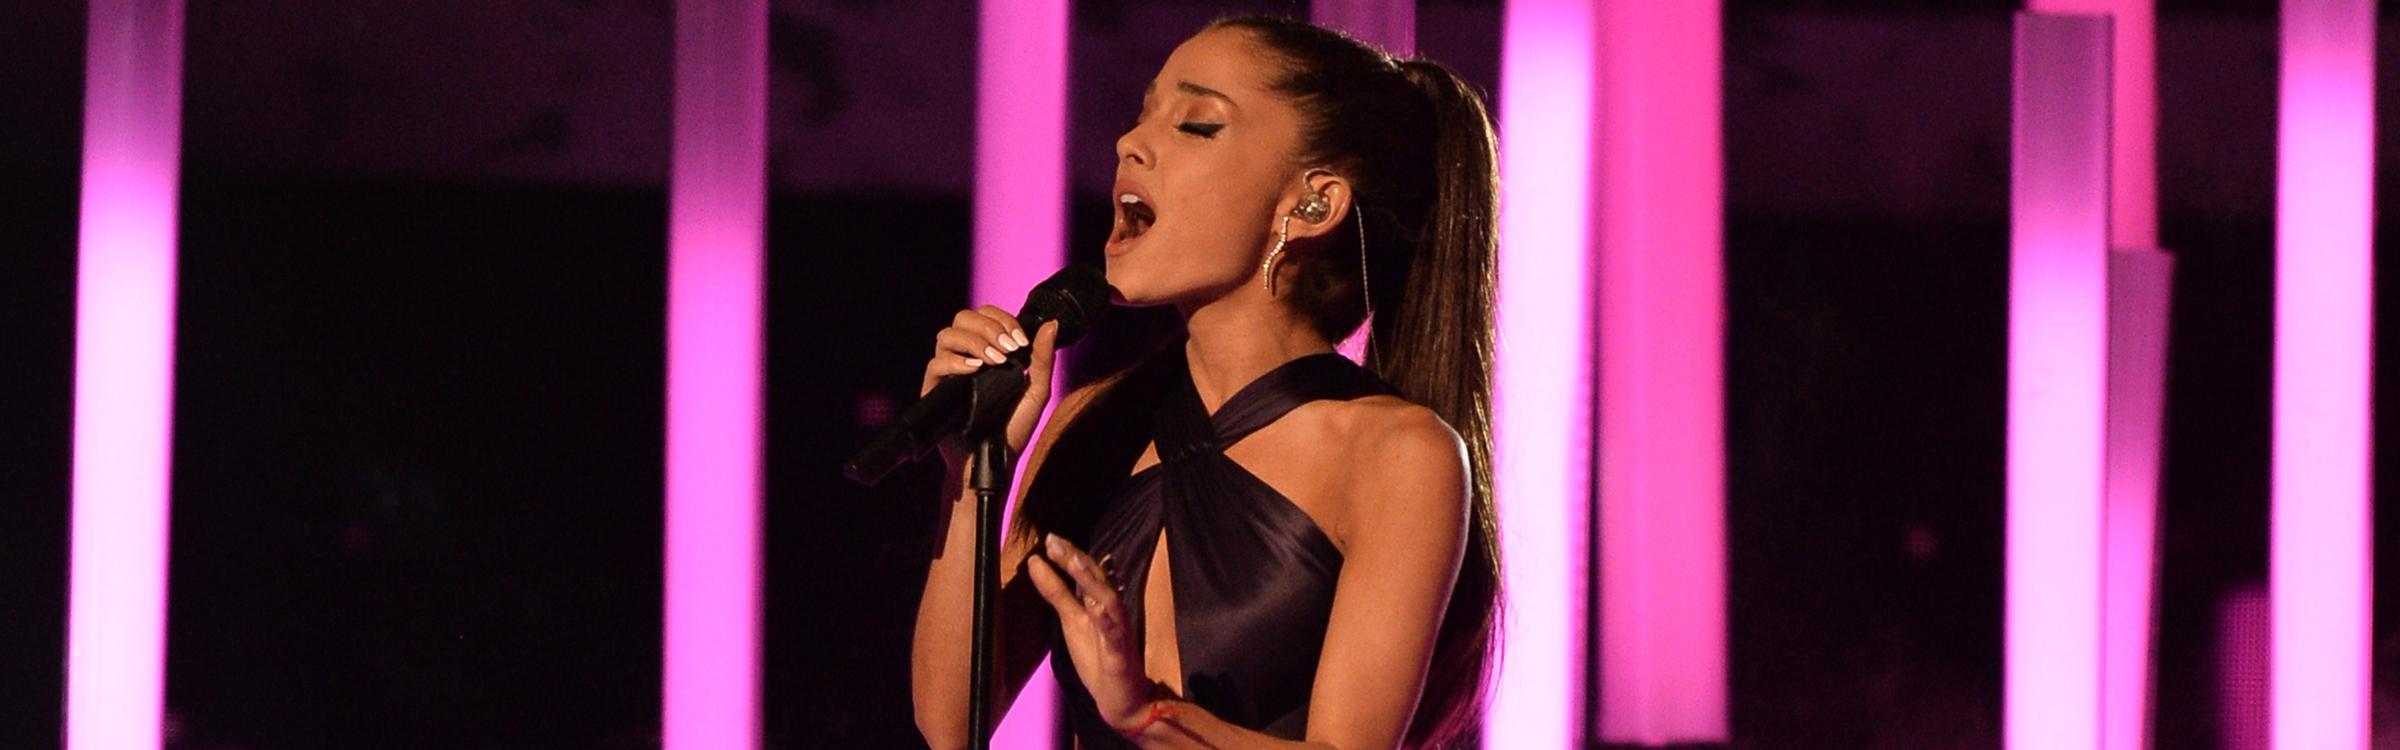 Ariana concert header